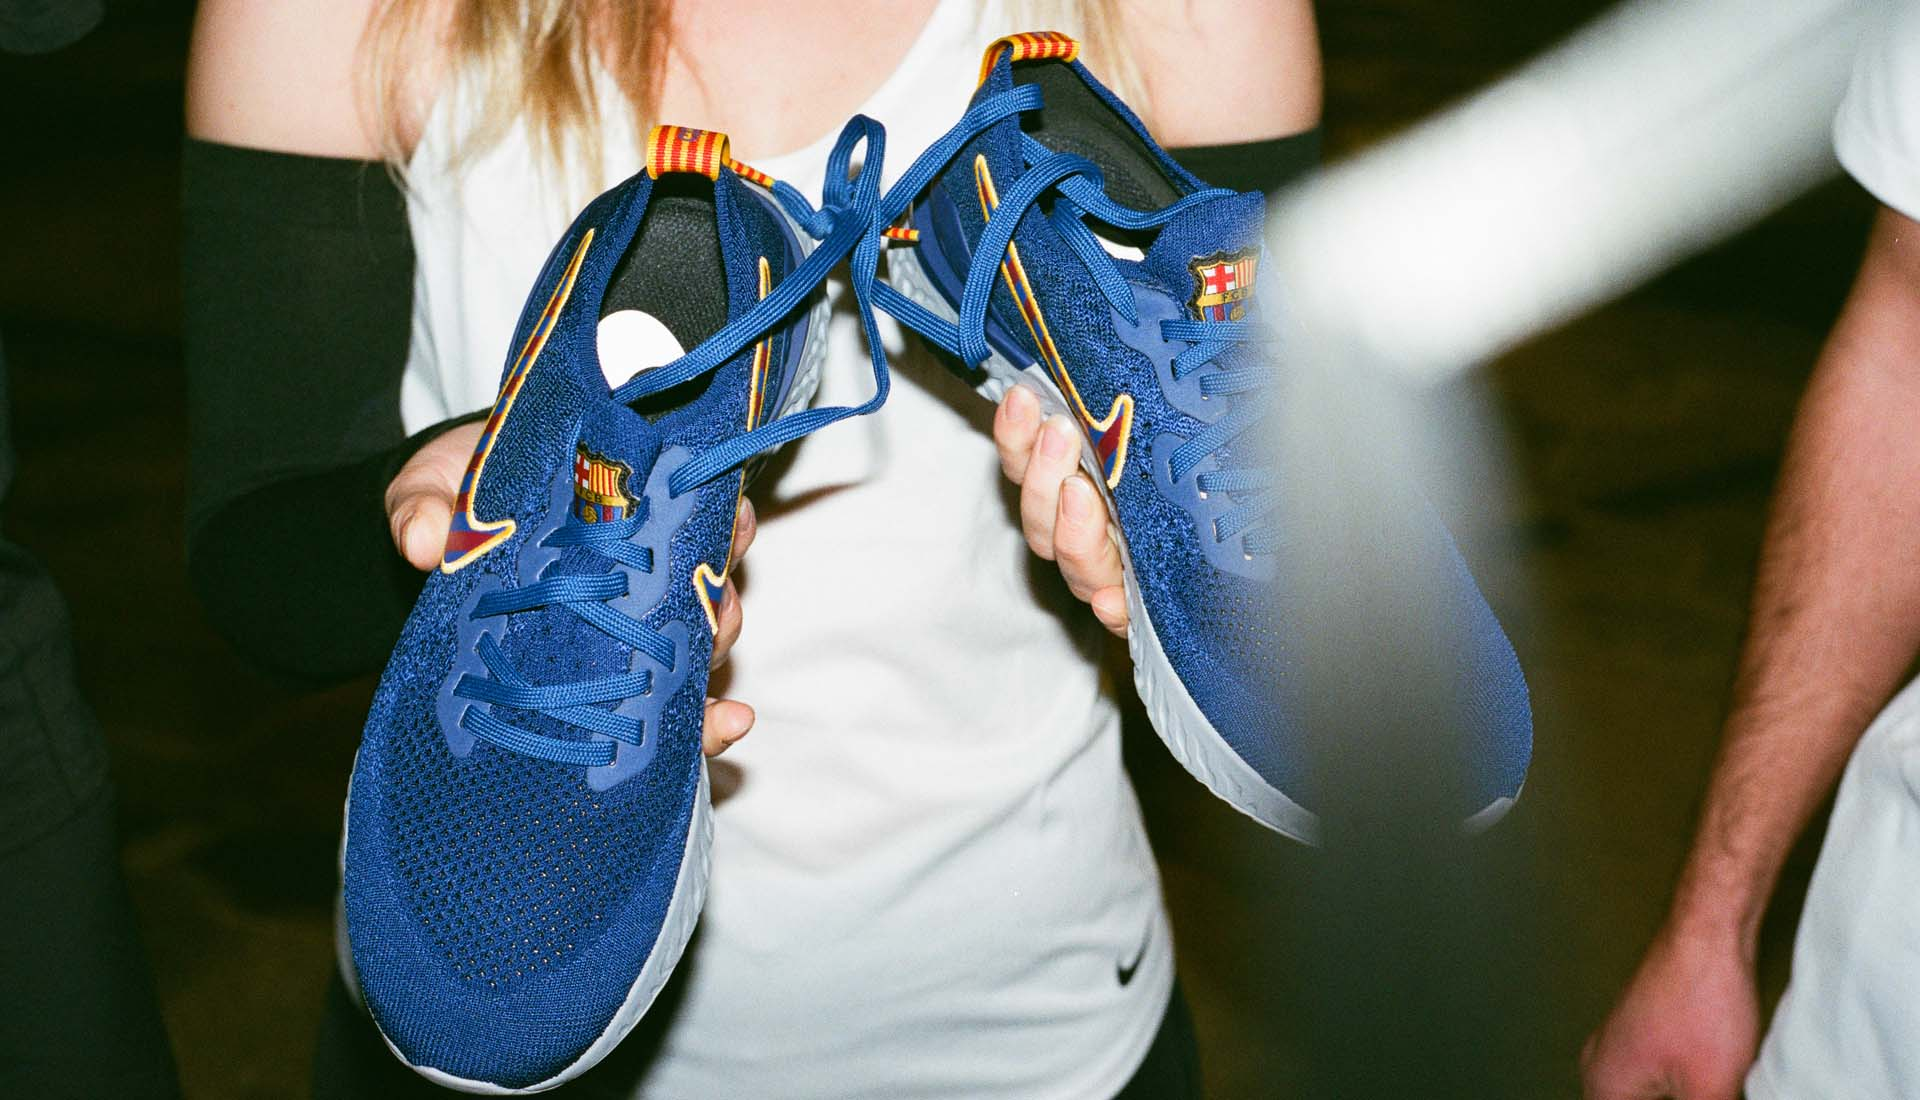 5-nike-barca-react-shoe